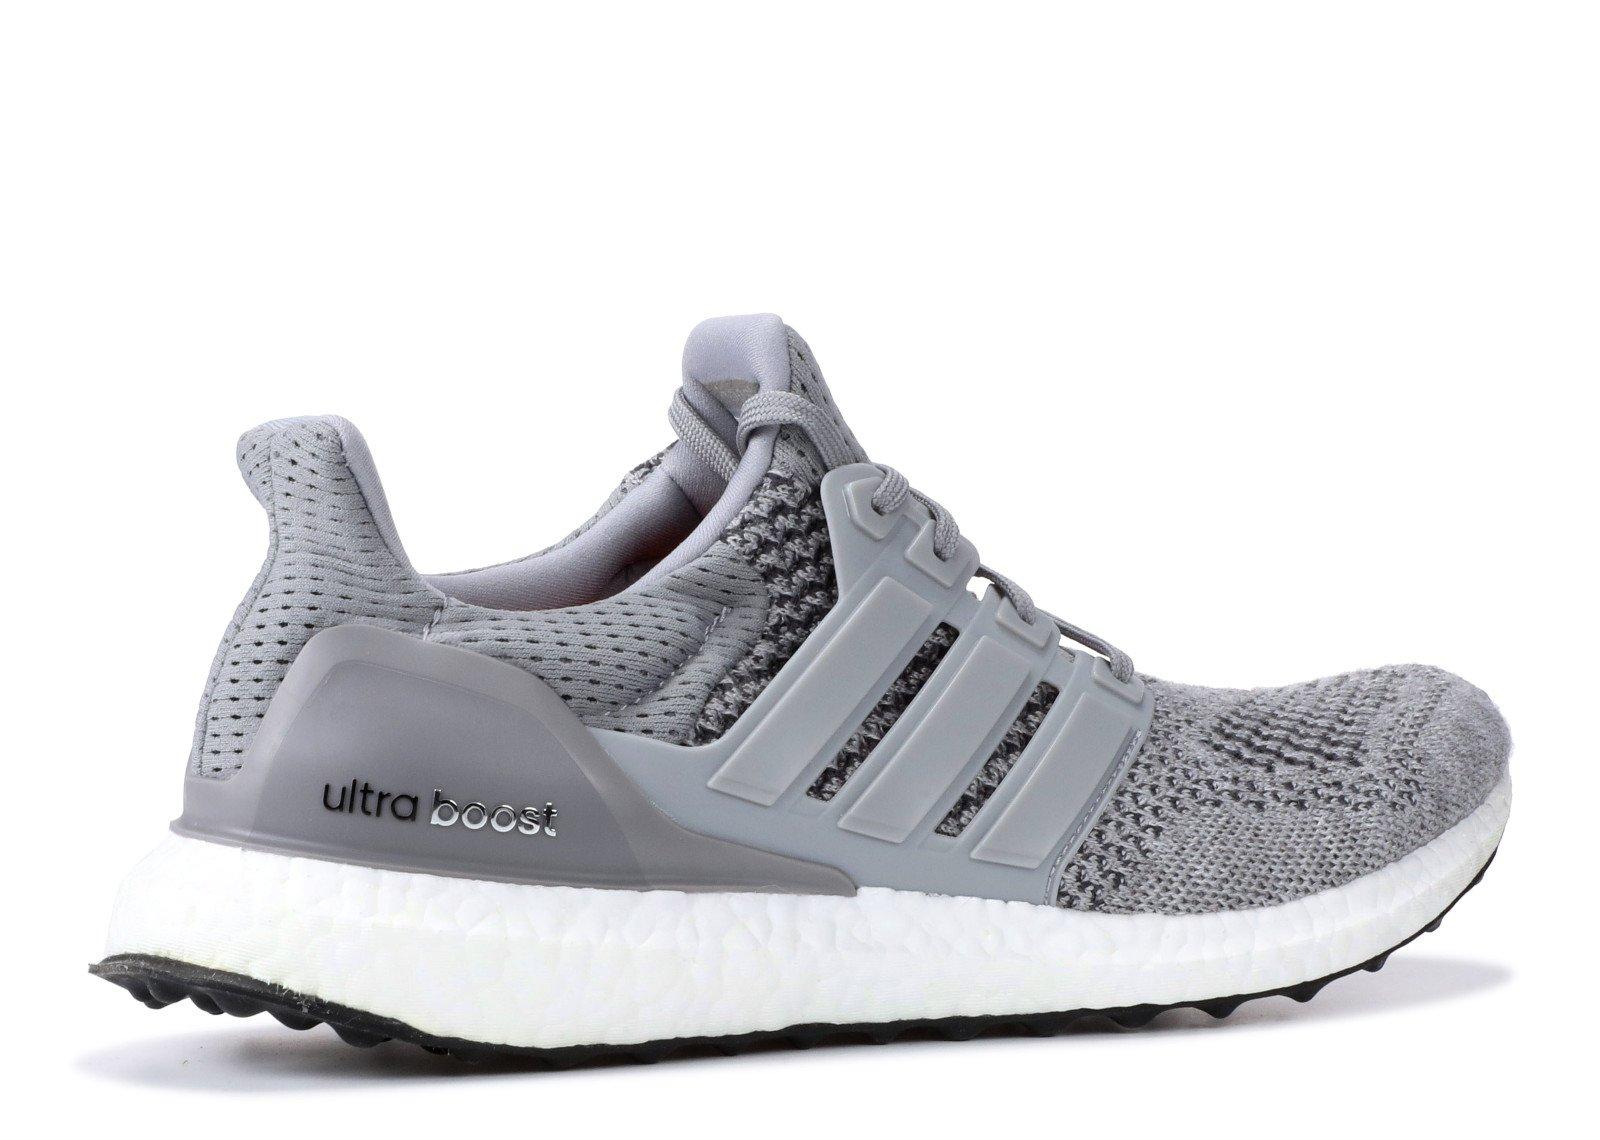 71B0An1ITdL - adidas Men's Ultra Boost M Running Shoes